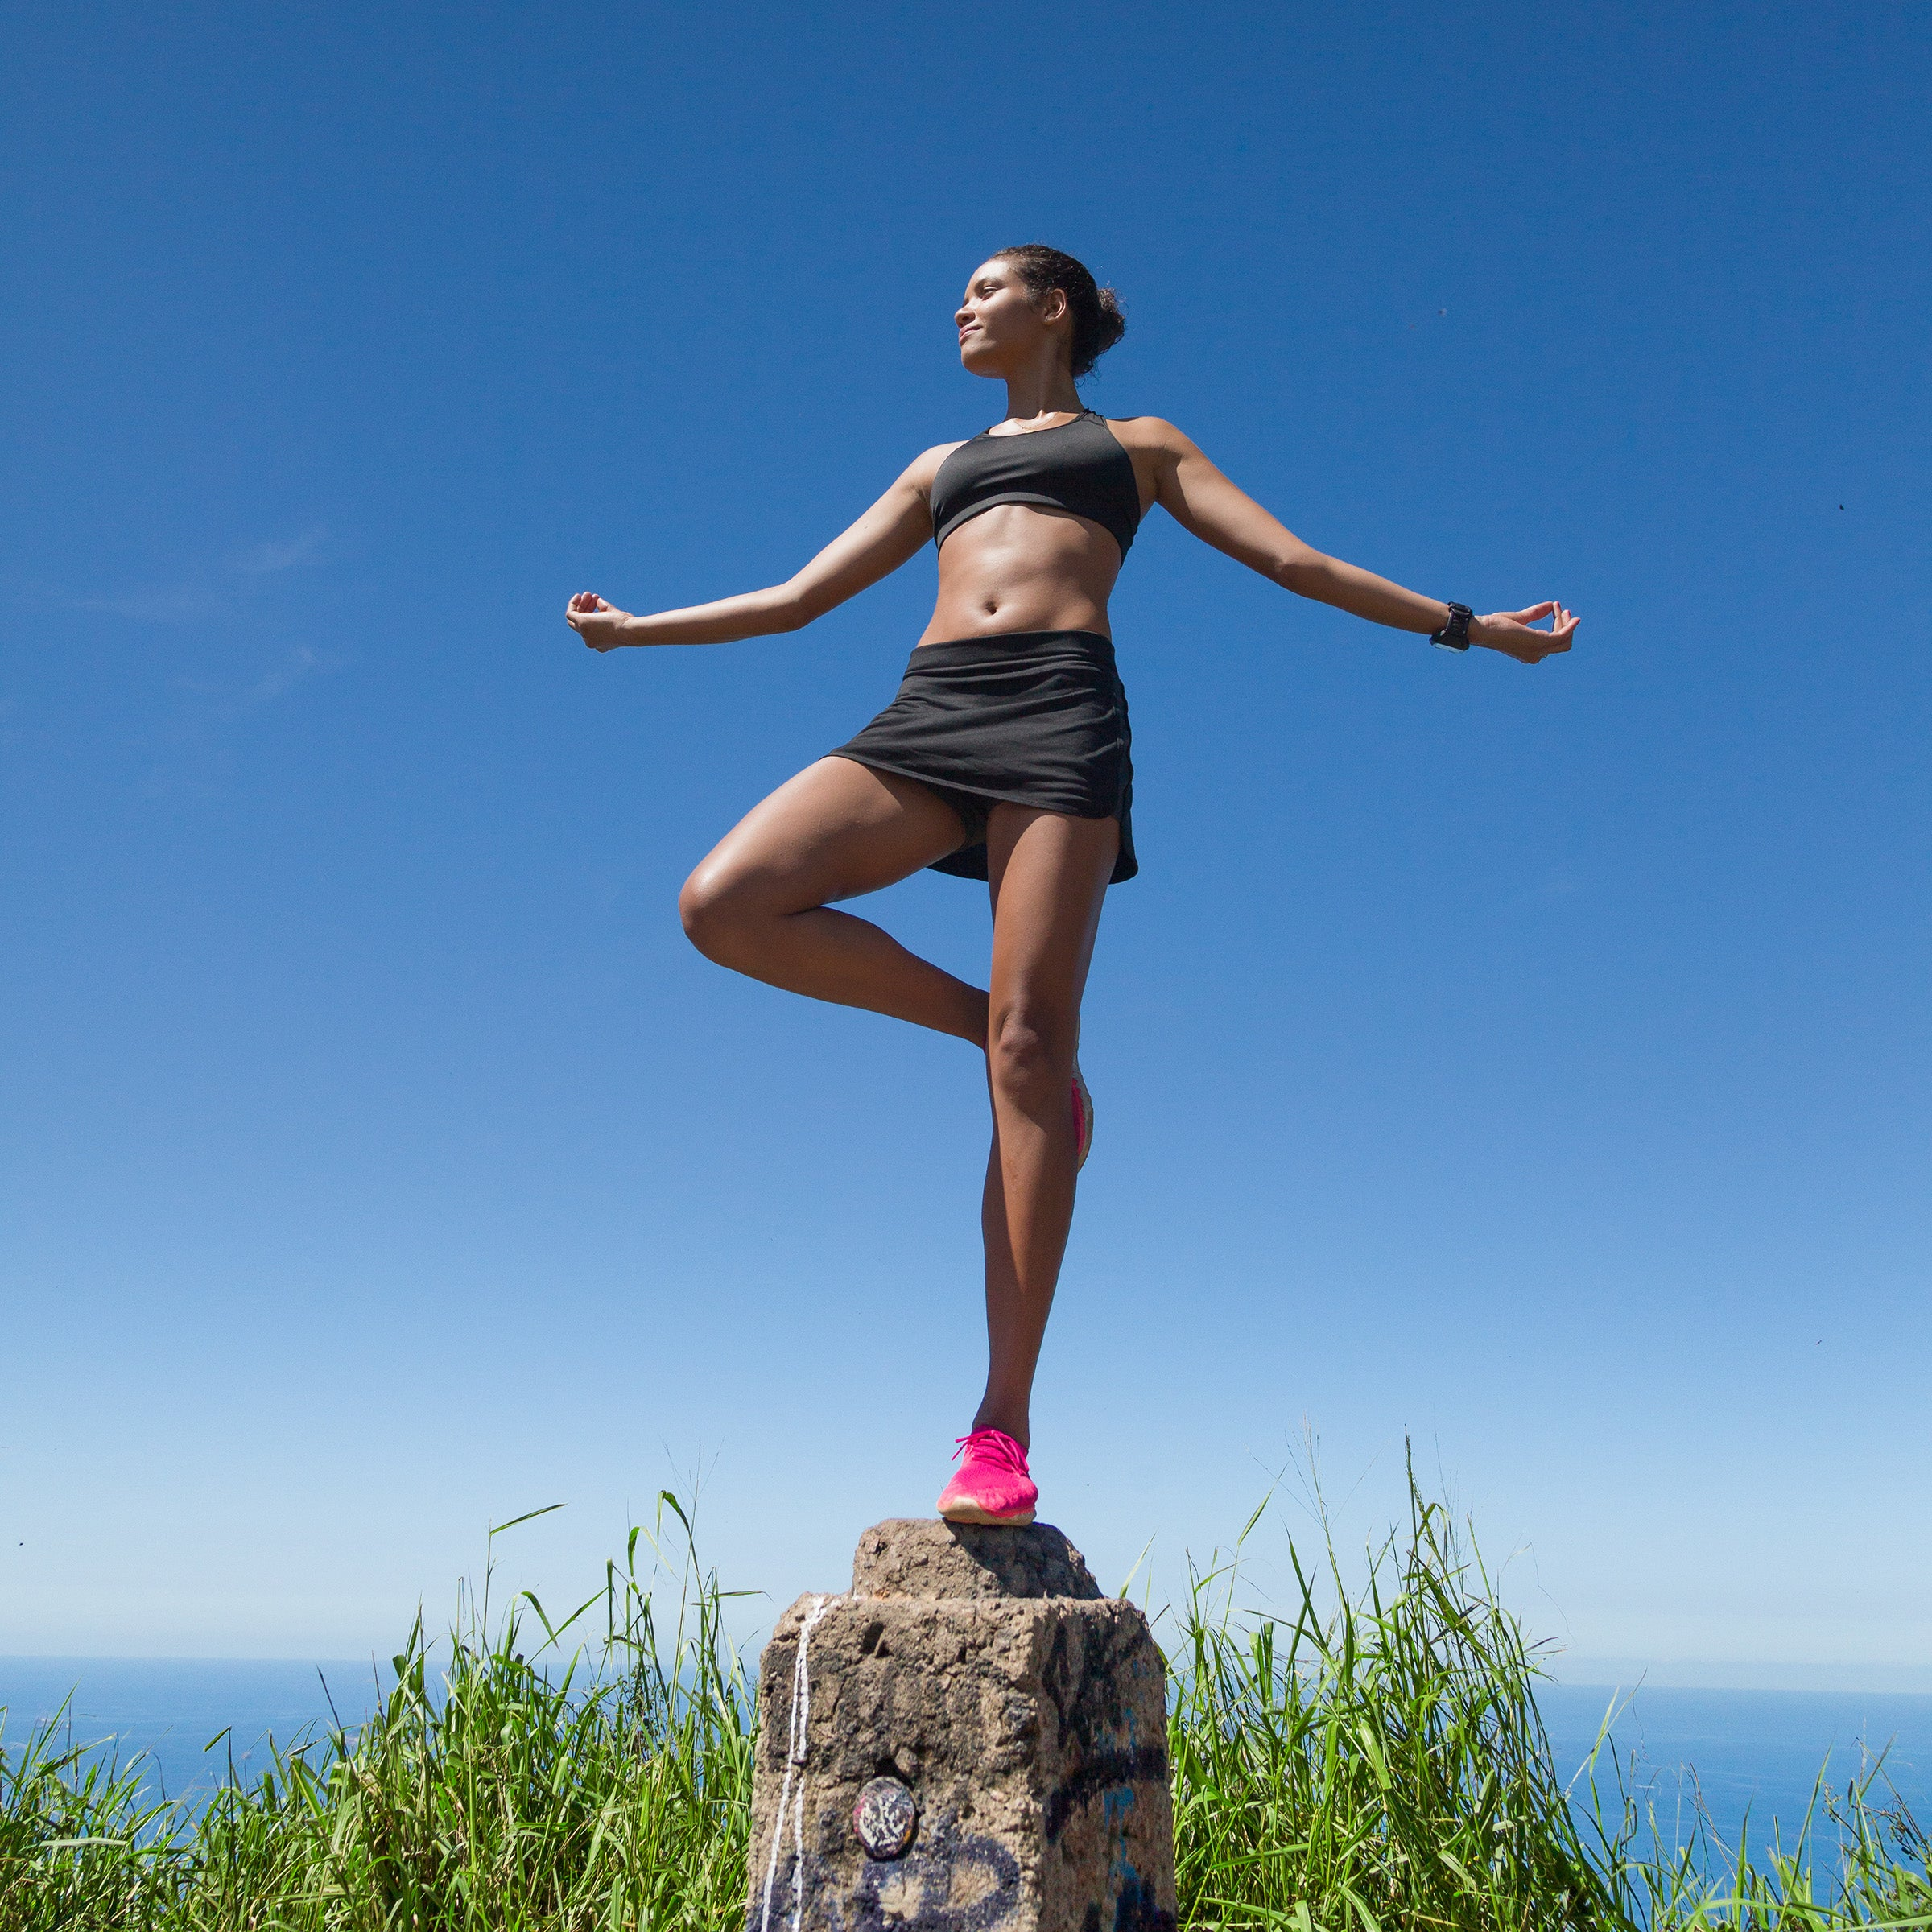 Single-leg balance assessment